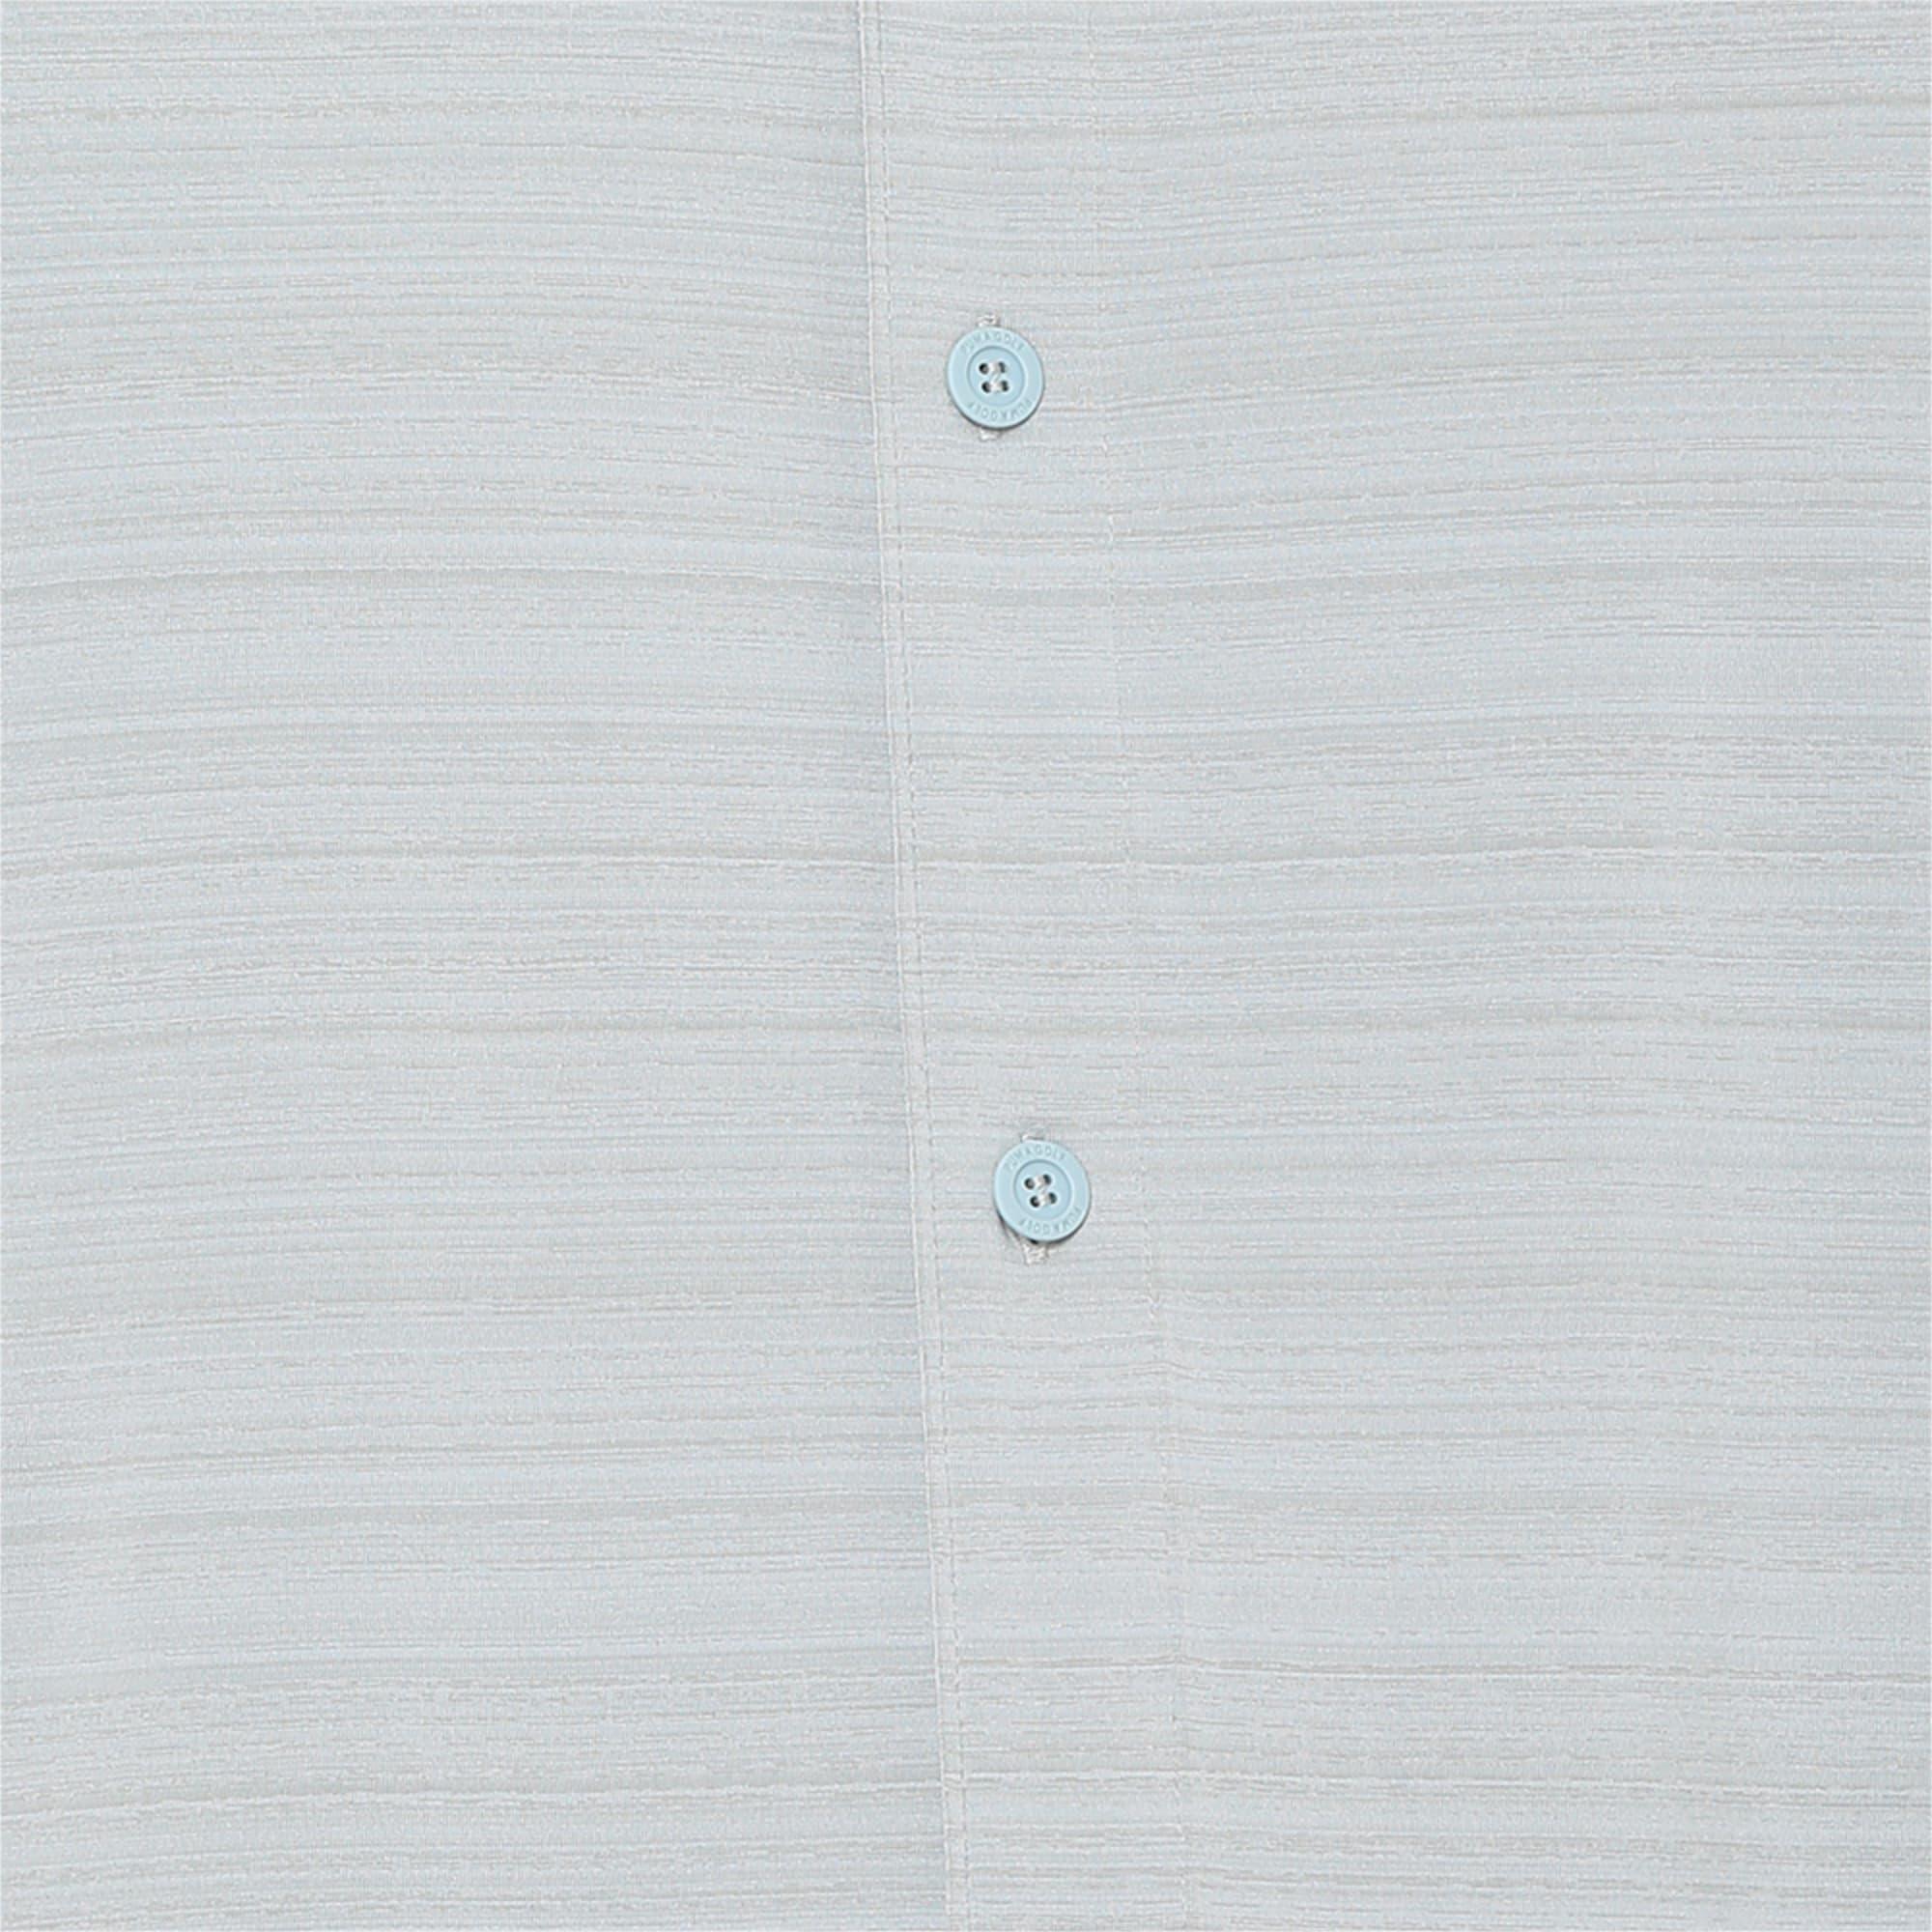 Thumbnail 6 of Breezer Short Sleeve Men's Golf Shirt, Quarry, medium-IND